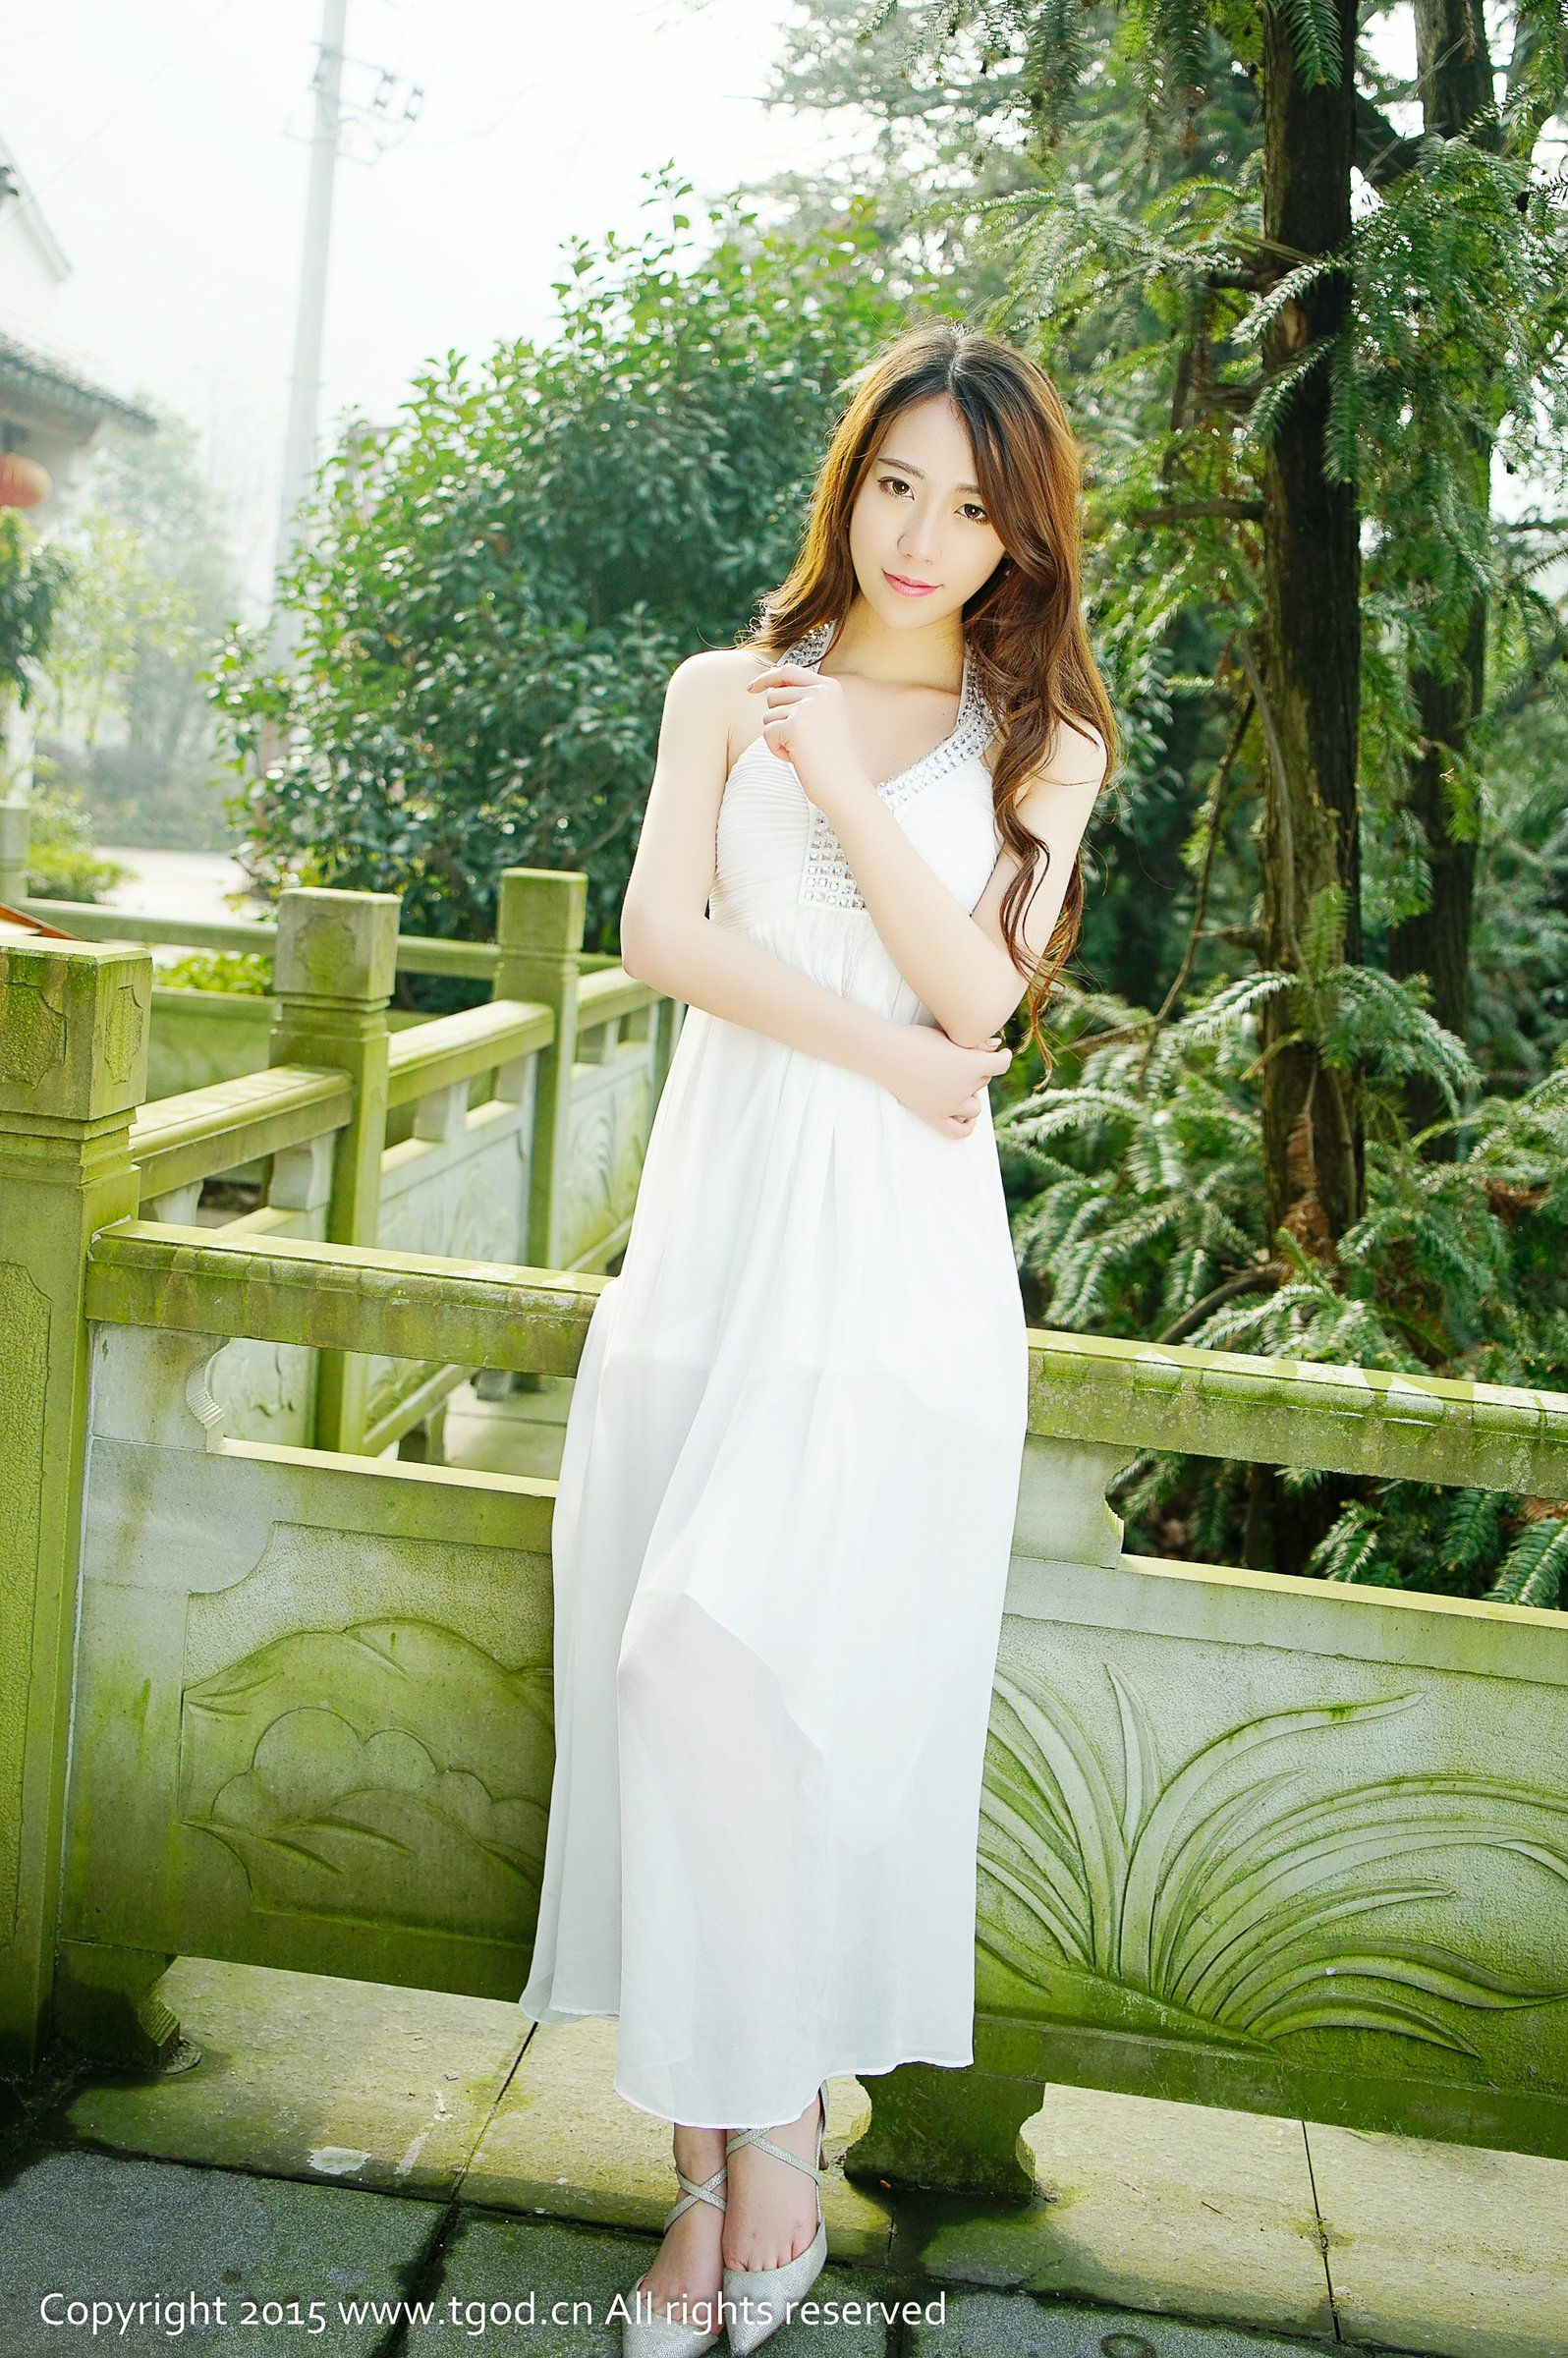 VOL.283 [推女神]长裙气质清新唯美女神长发美女:邓雪(邓雪Sweet)高品质写真套图(54P)